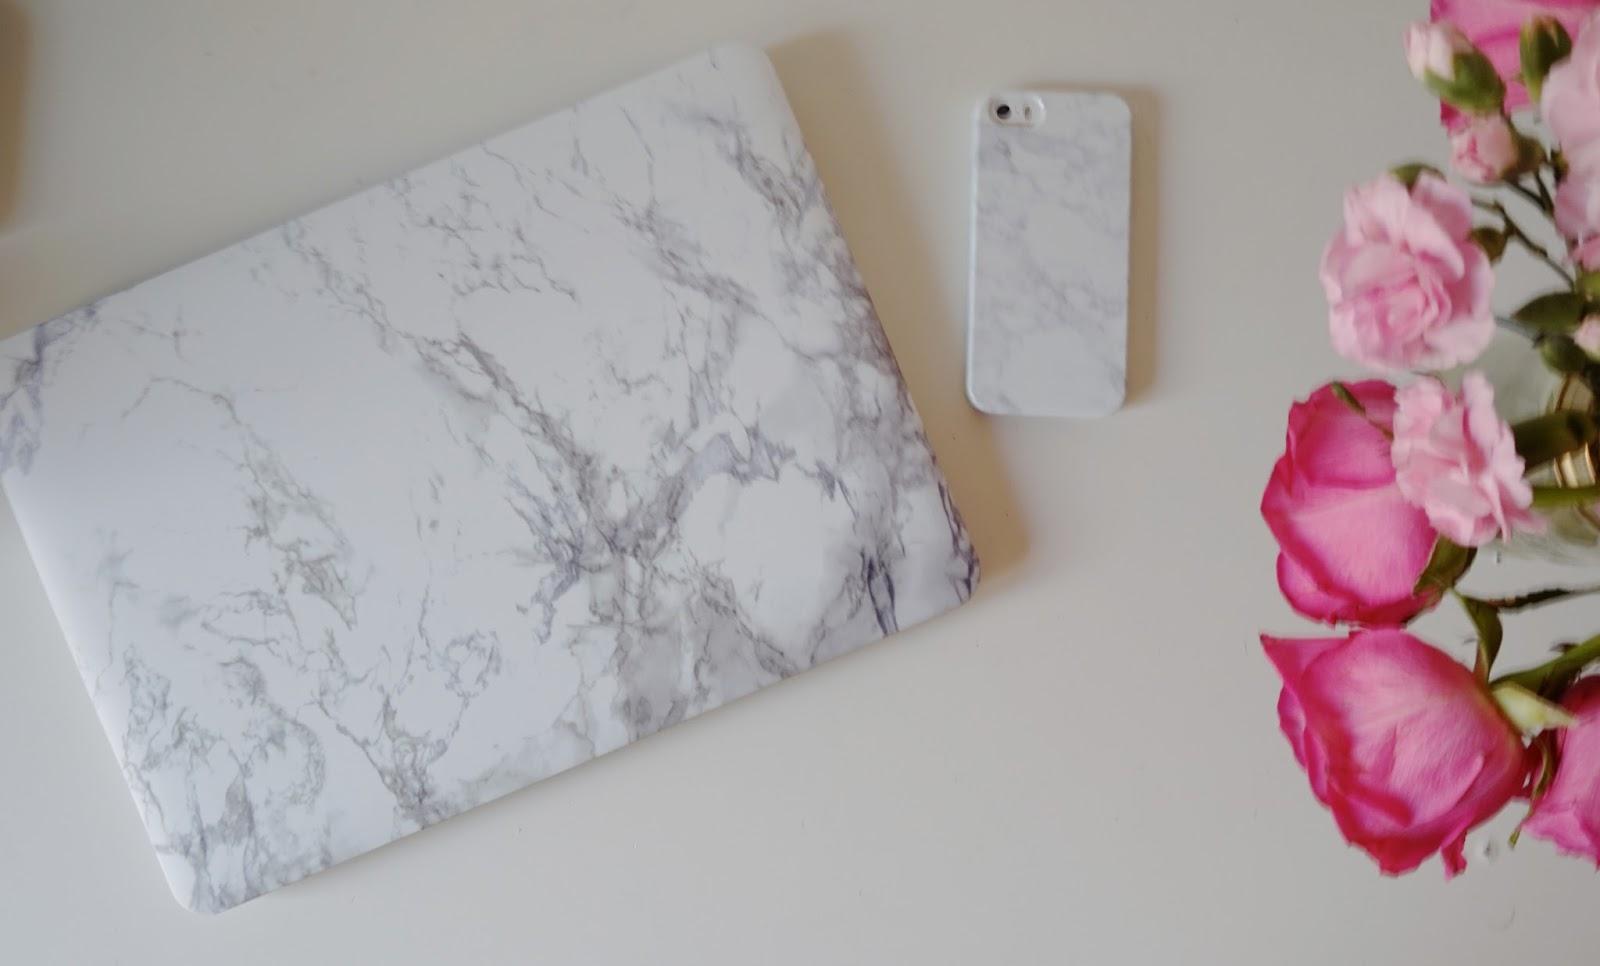 decoration, home decor, huggle up, iPhone case, laptop case, Lifestyle, marble, marble case, phone case, tech case,